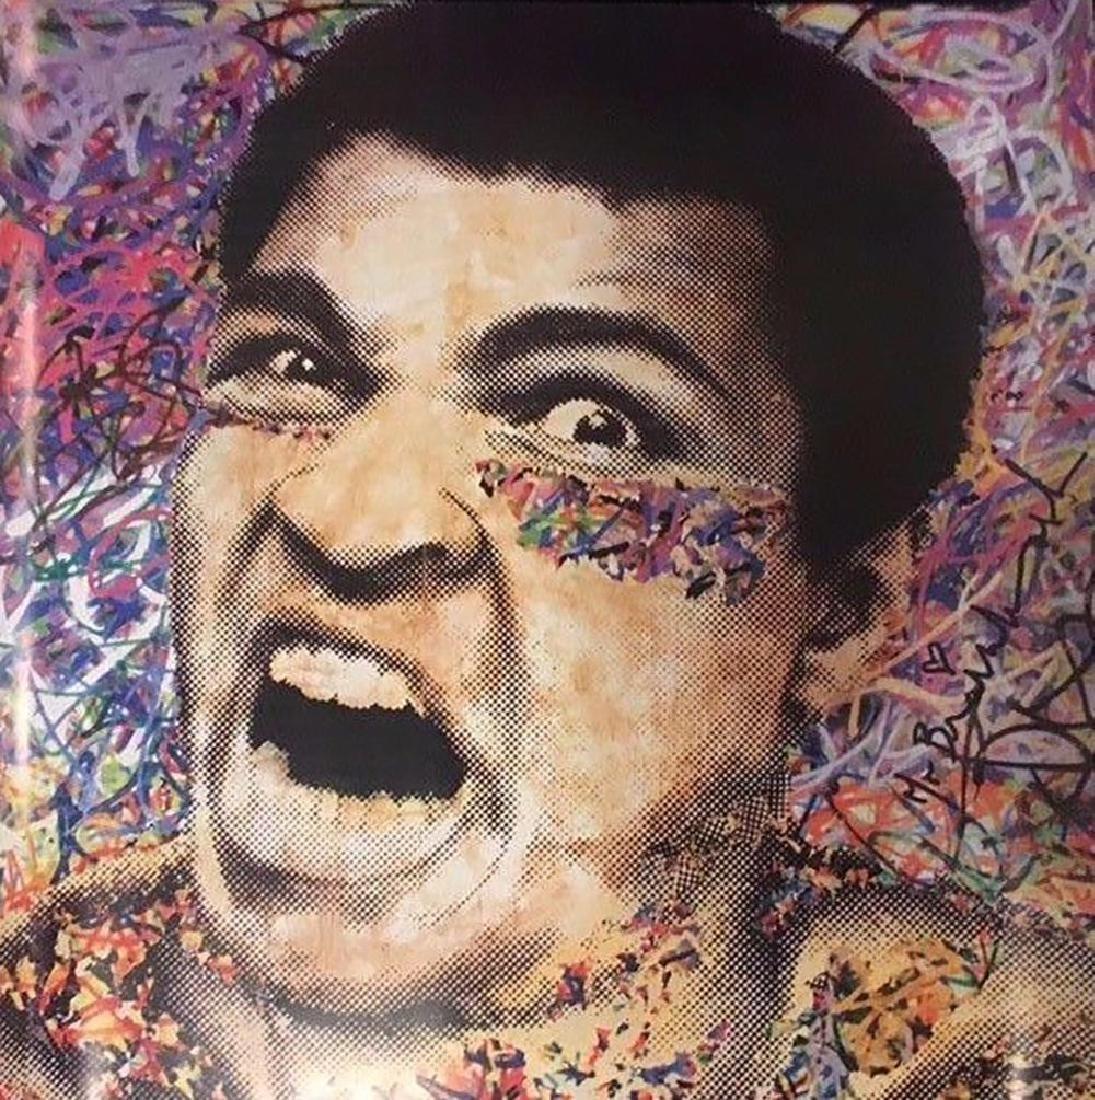 Mr Brainwash Ali The Greatest Offset Lithograph framed